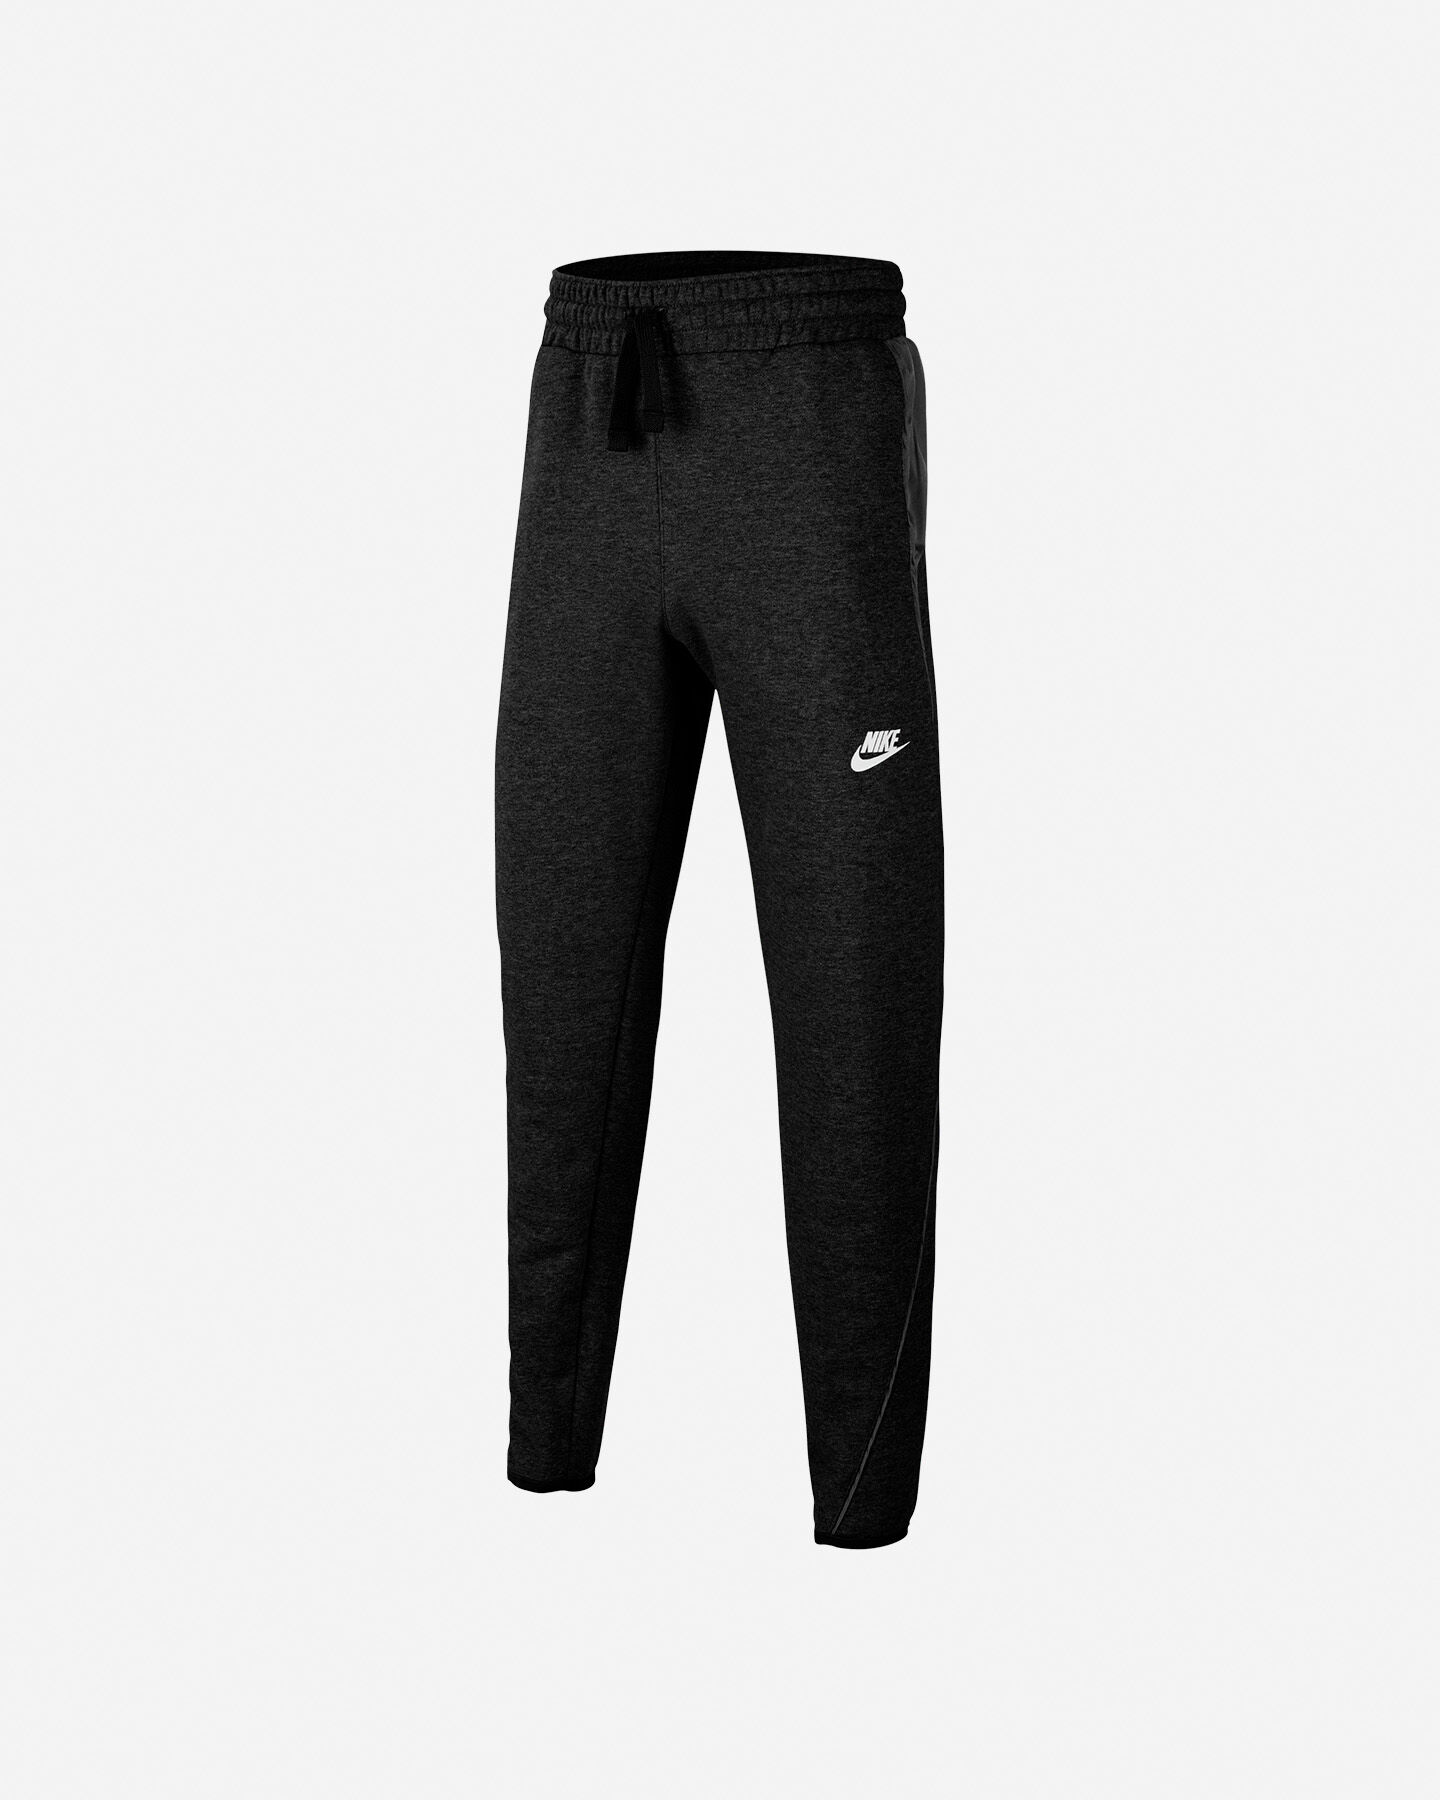 Pantalone NIKE SPORTSWEAR JR S5225768 scatto 0